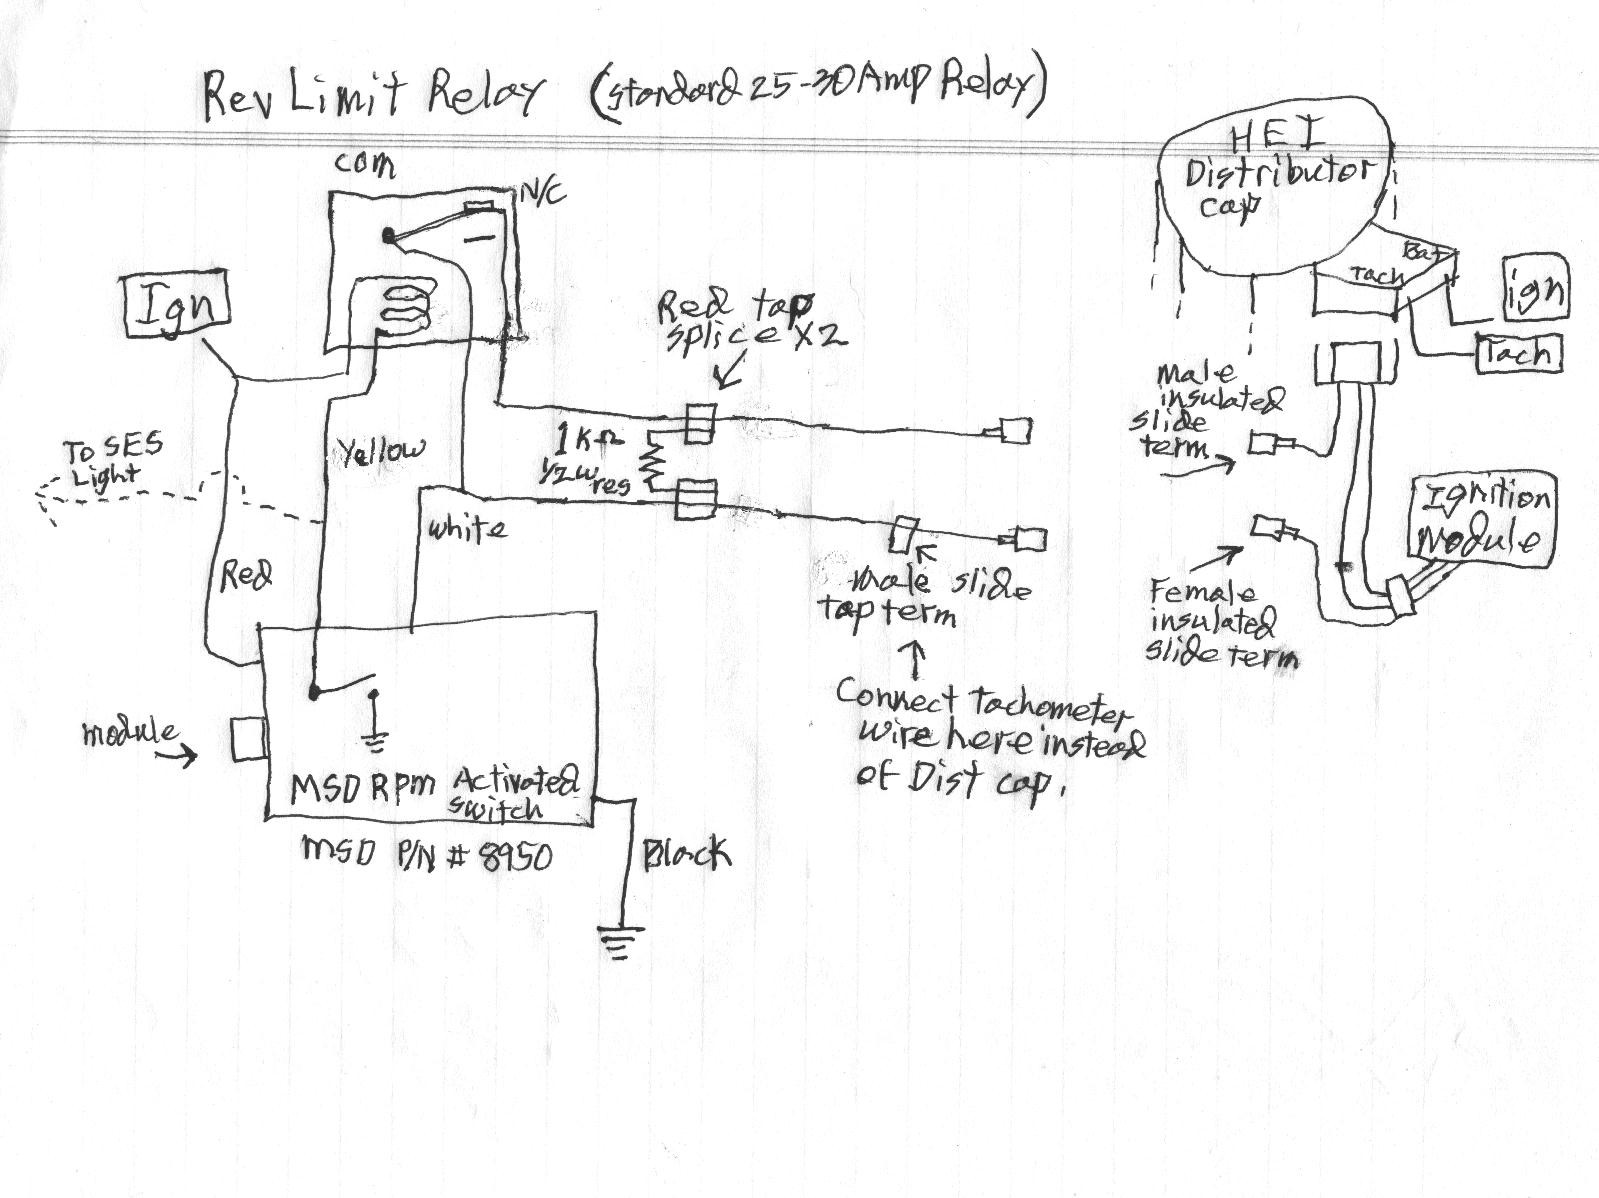 chevy hei distributor wiring diagram eg 7041  tachometer wiring diagram also chevy hei distributor  eg 7041  tachometer wiring diagram also